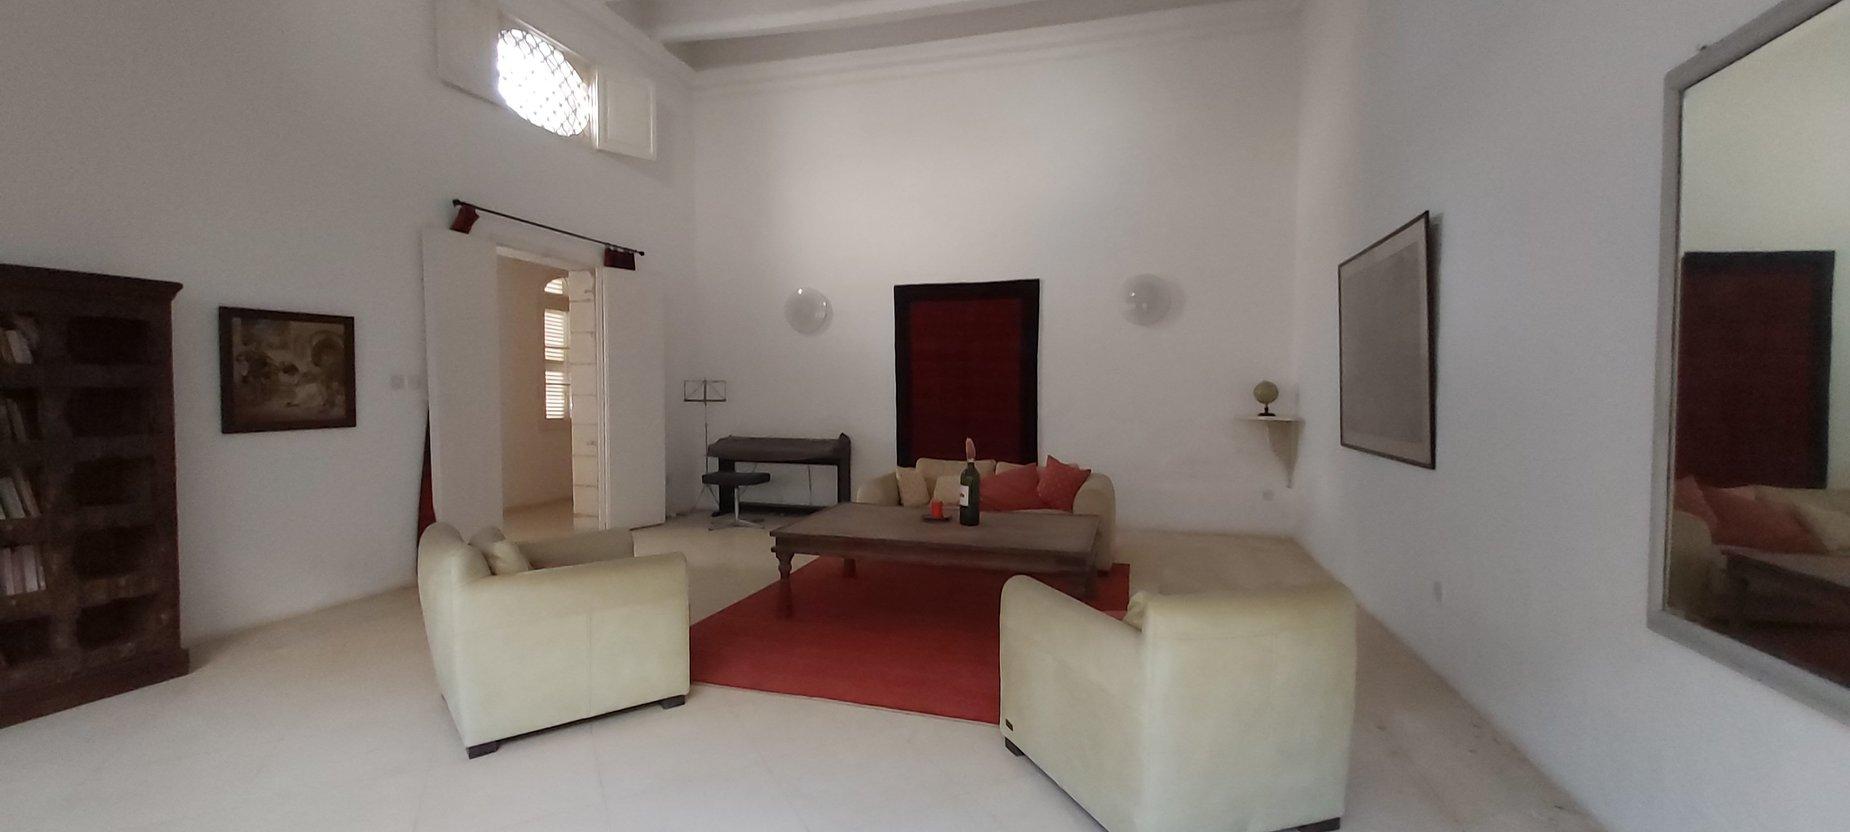 5 bed Town House For Sale in Lija, Lija - thumb 16